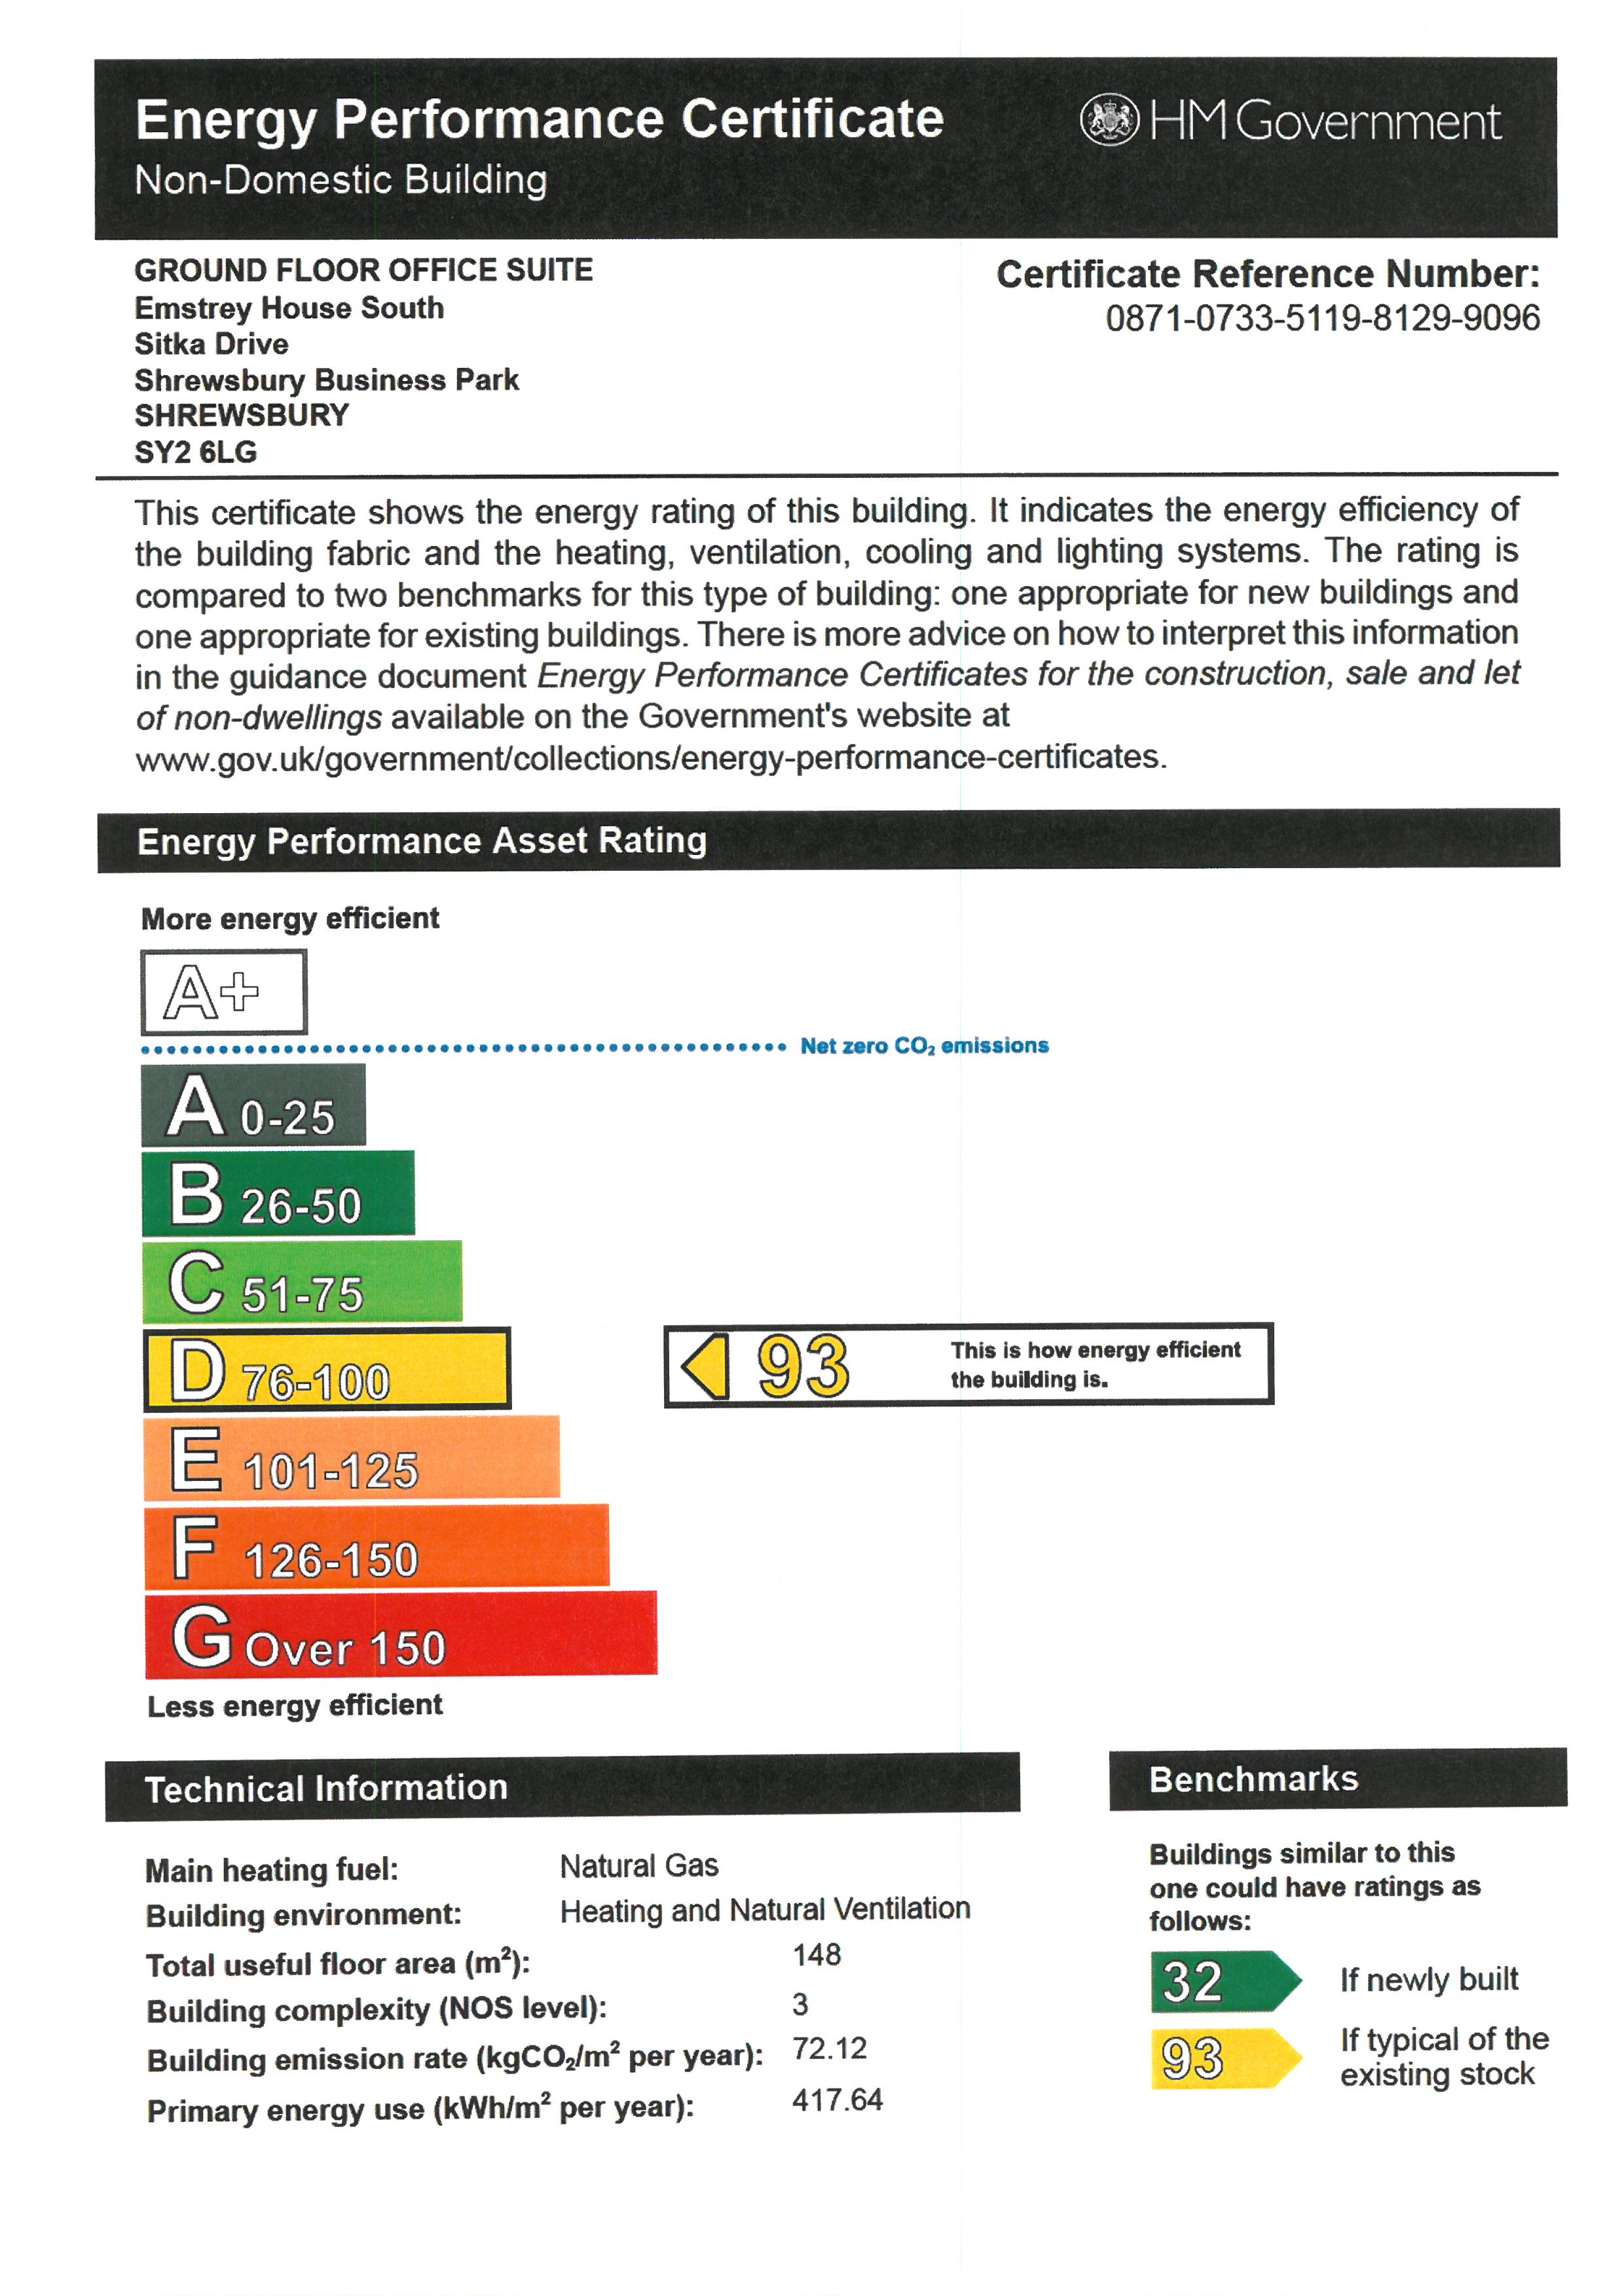 EPC for Ground Floor Premises, Emstrey House South, Shrewsbury, sy2 6lg